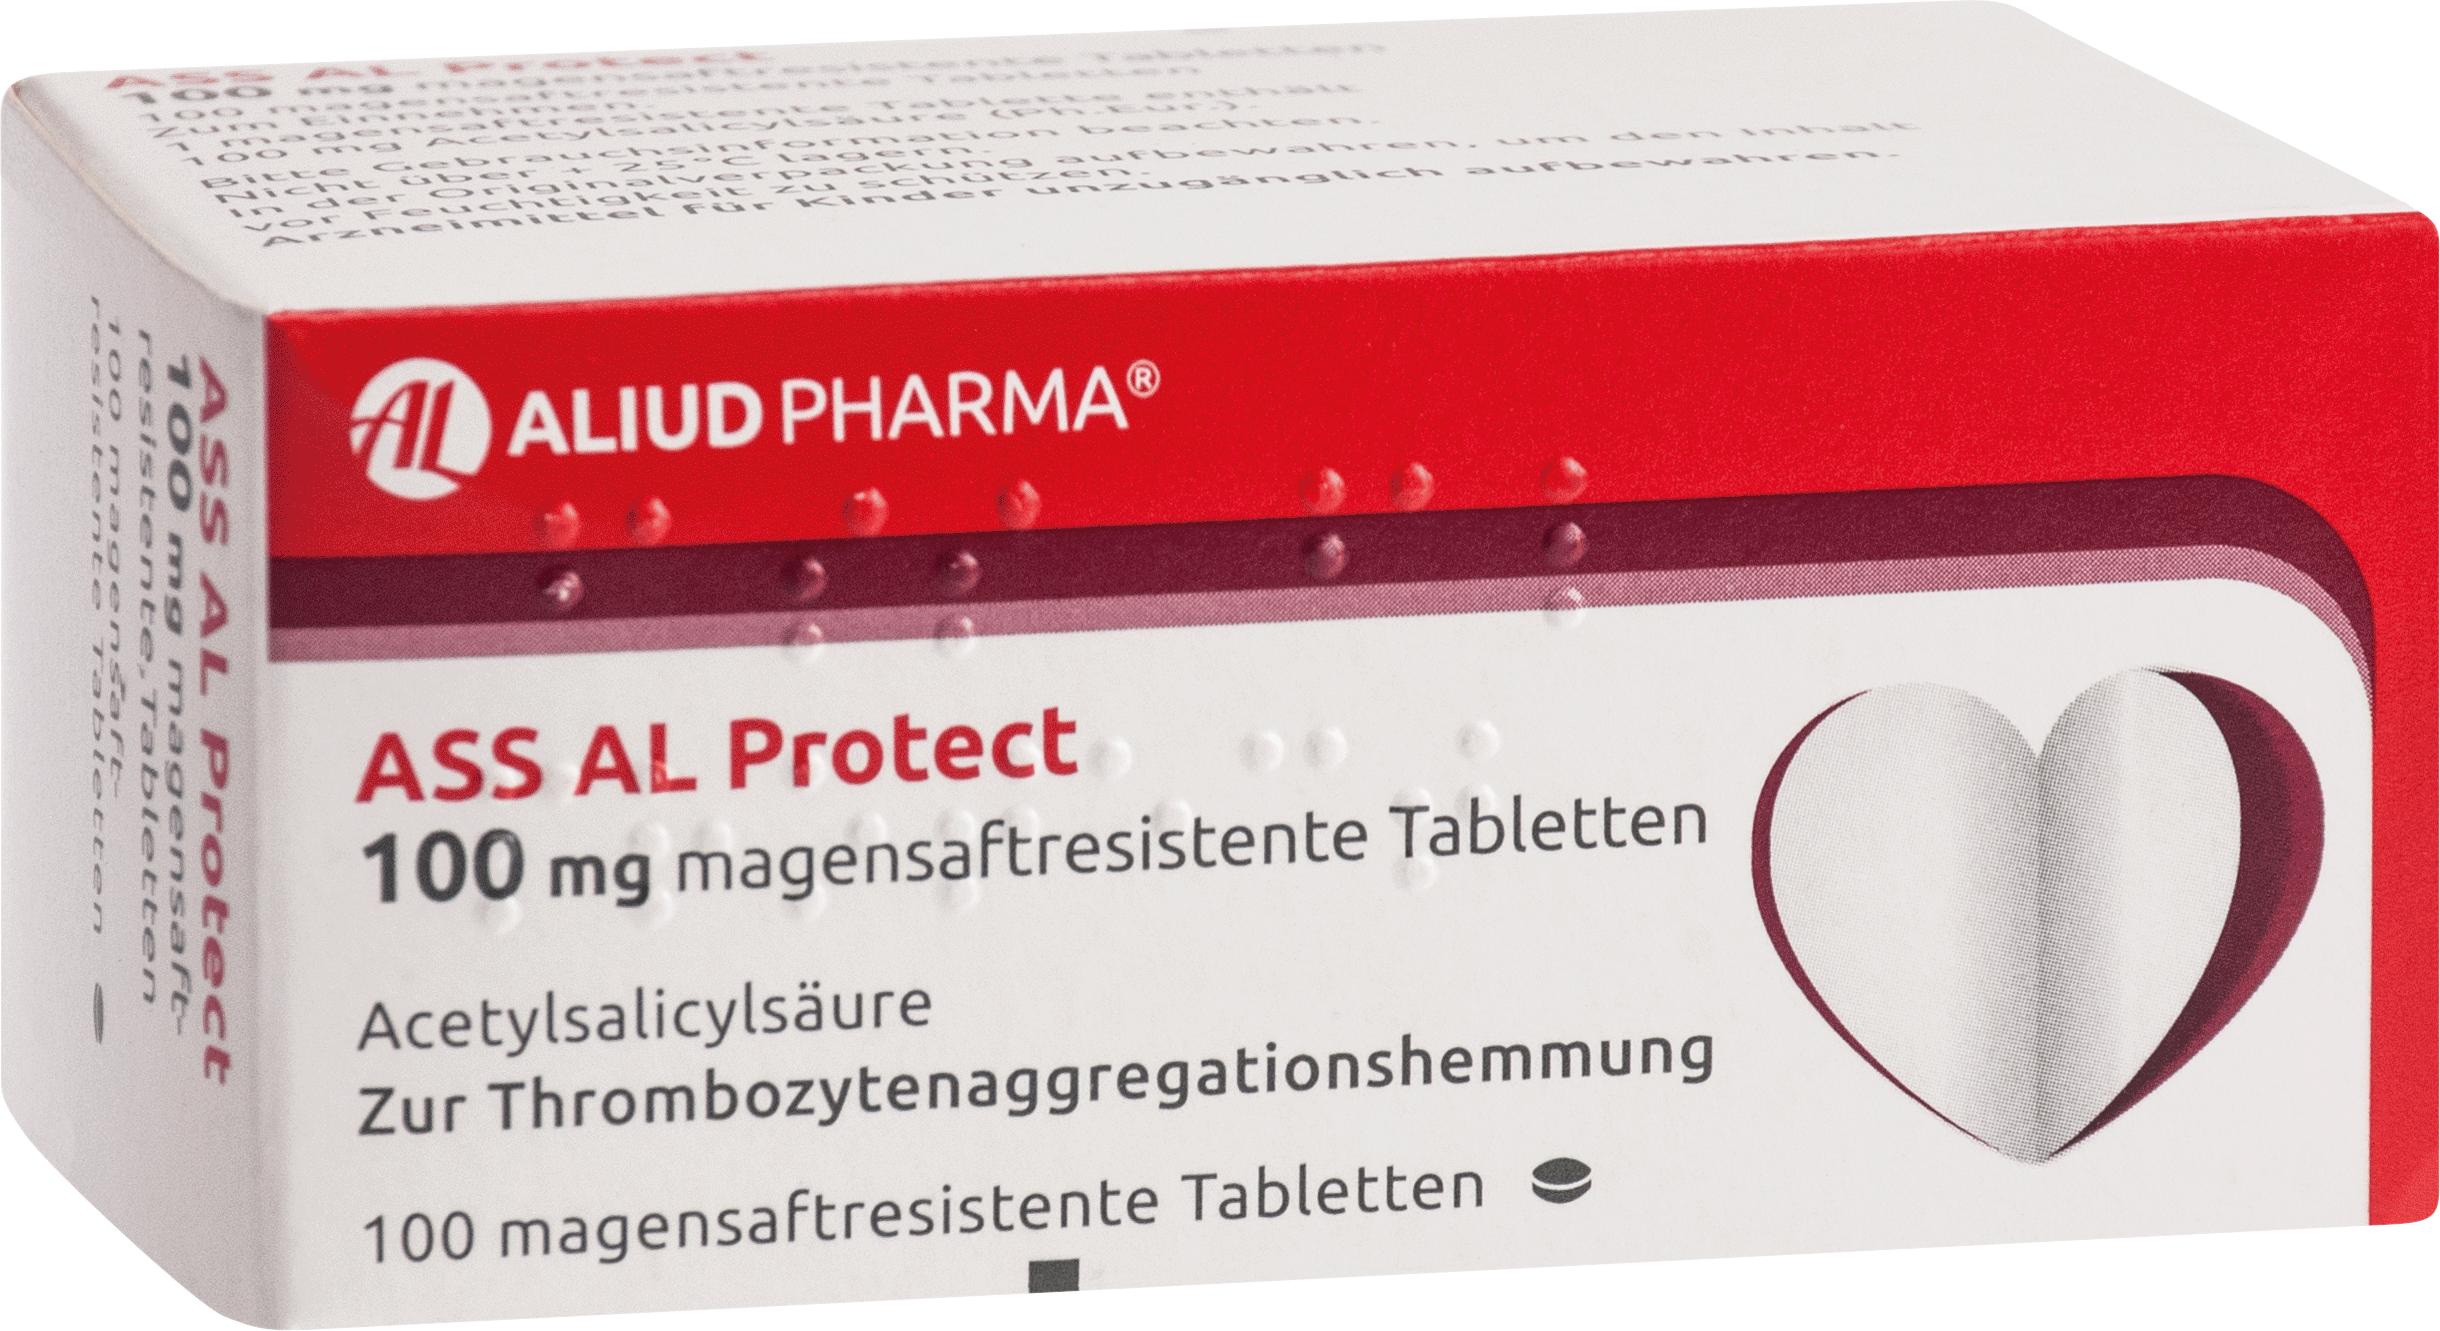 ASS AL Protect 100mg magensaftresistente Tabletten